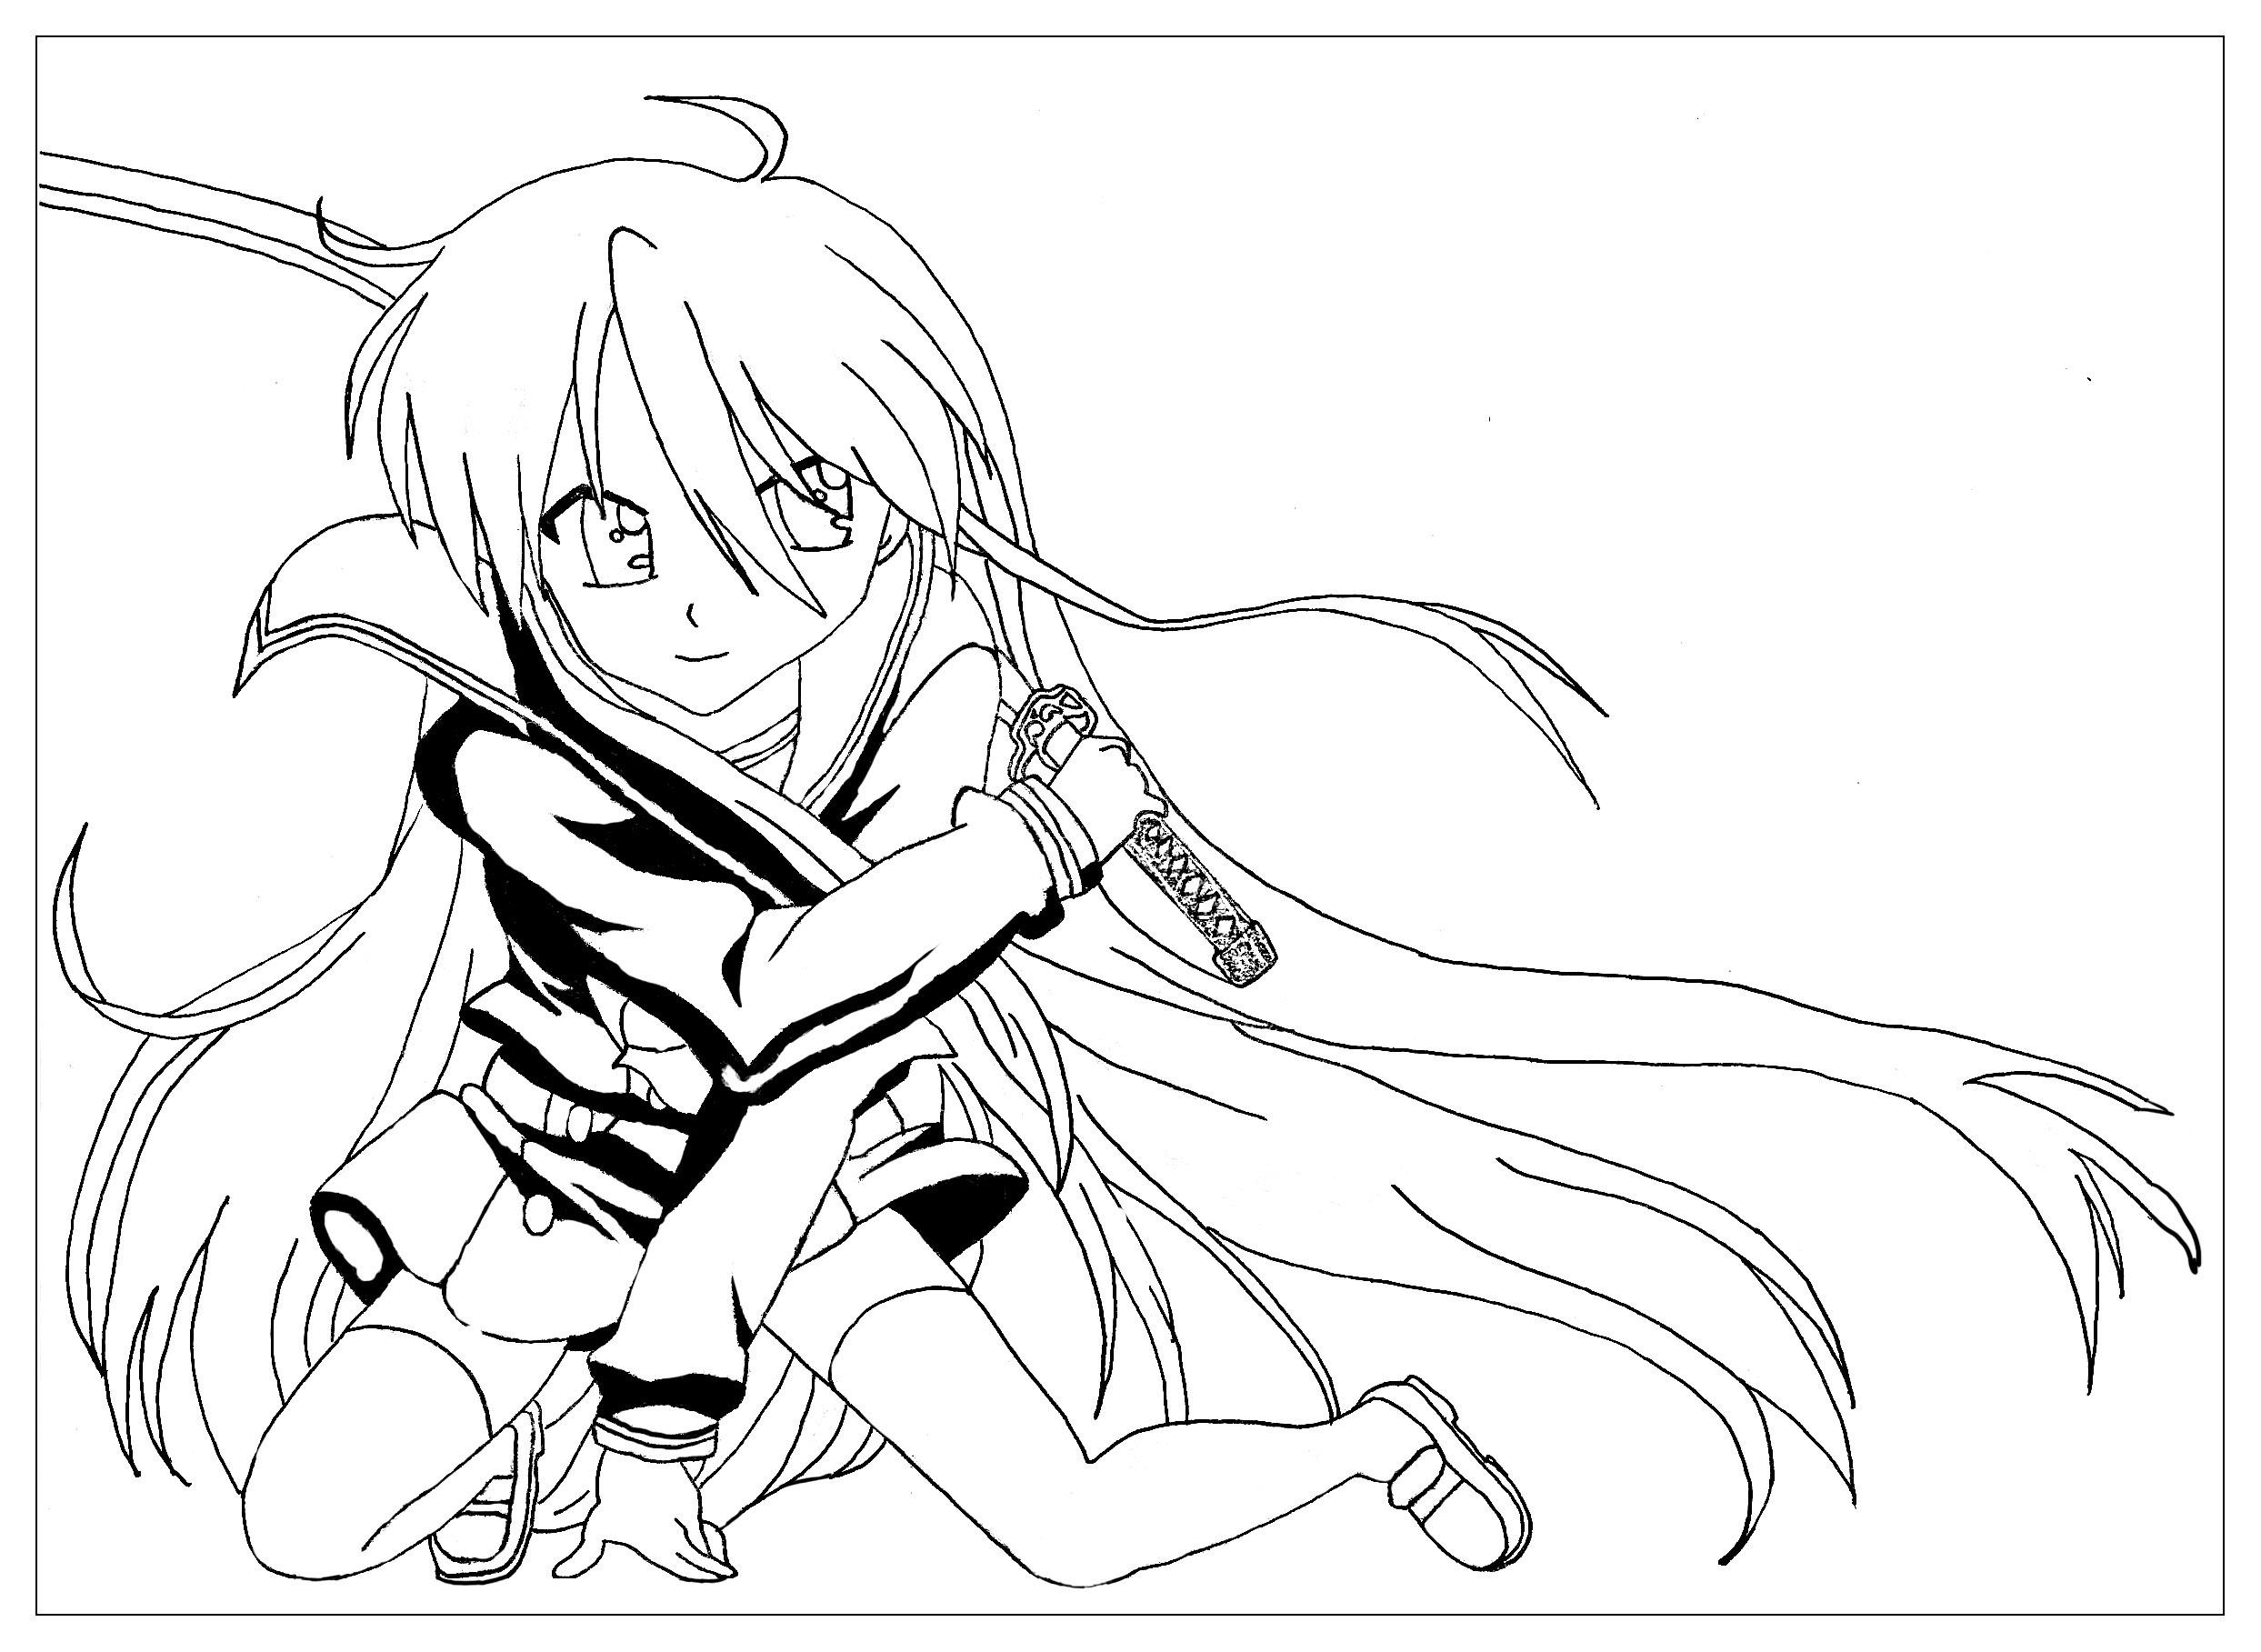 La fille au sabre, Un dessin manga originalA partir de la galerie : MangasArtiste : Krissy